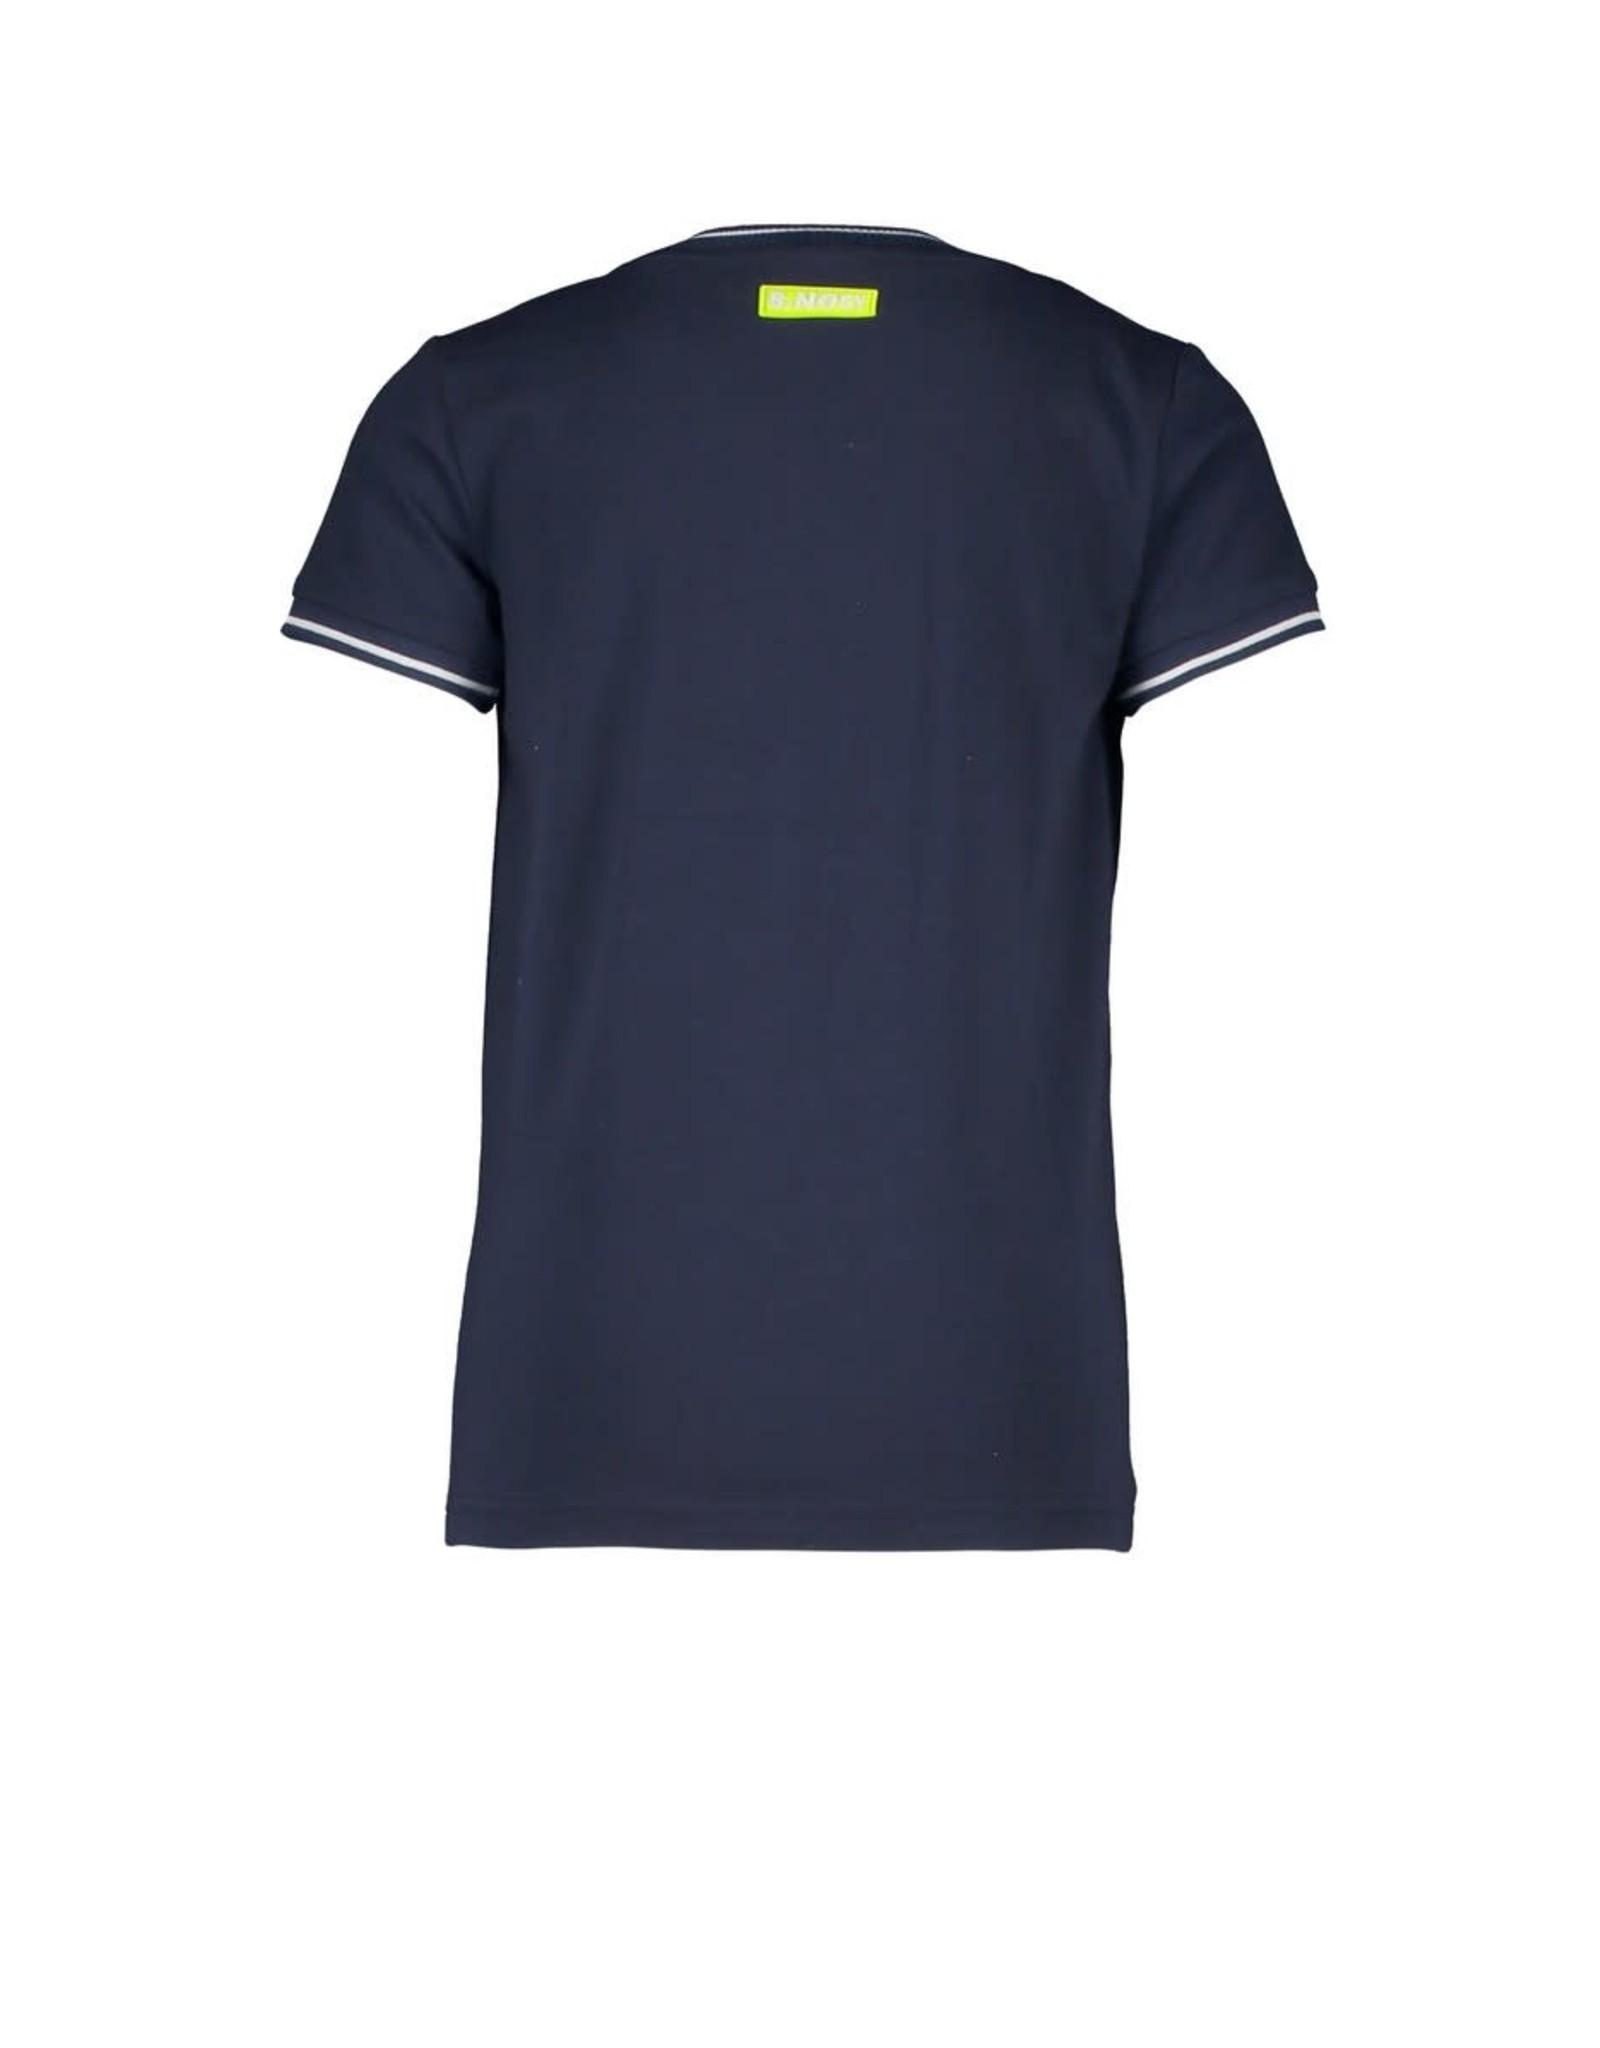 B.Nosy B.Nosy jongens t-shirt Forward Stripe Safety Yellow